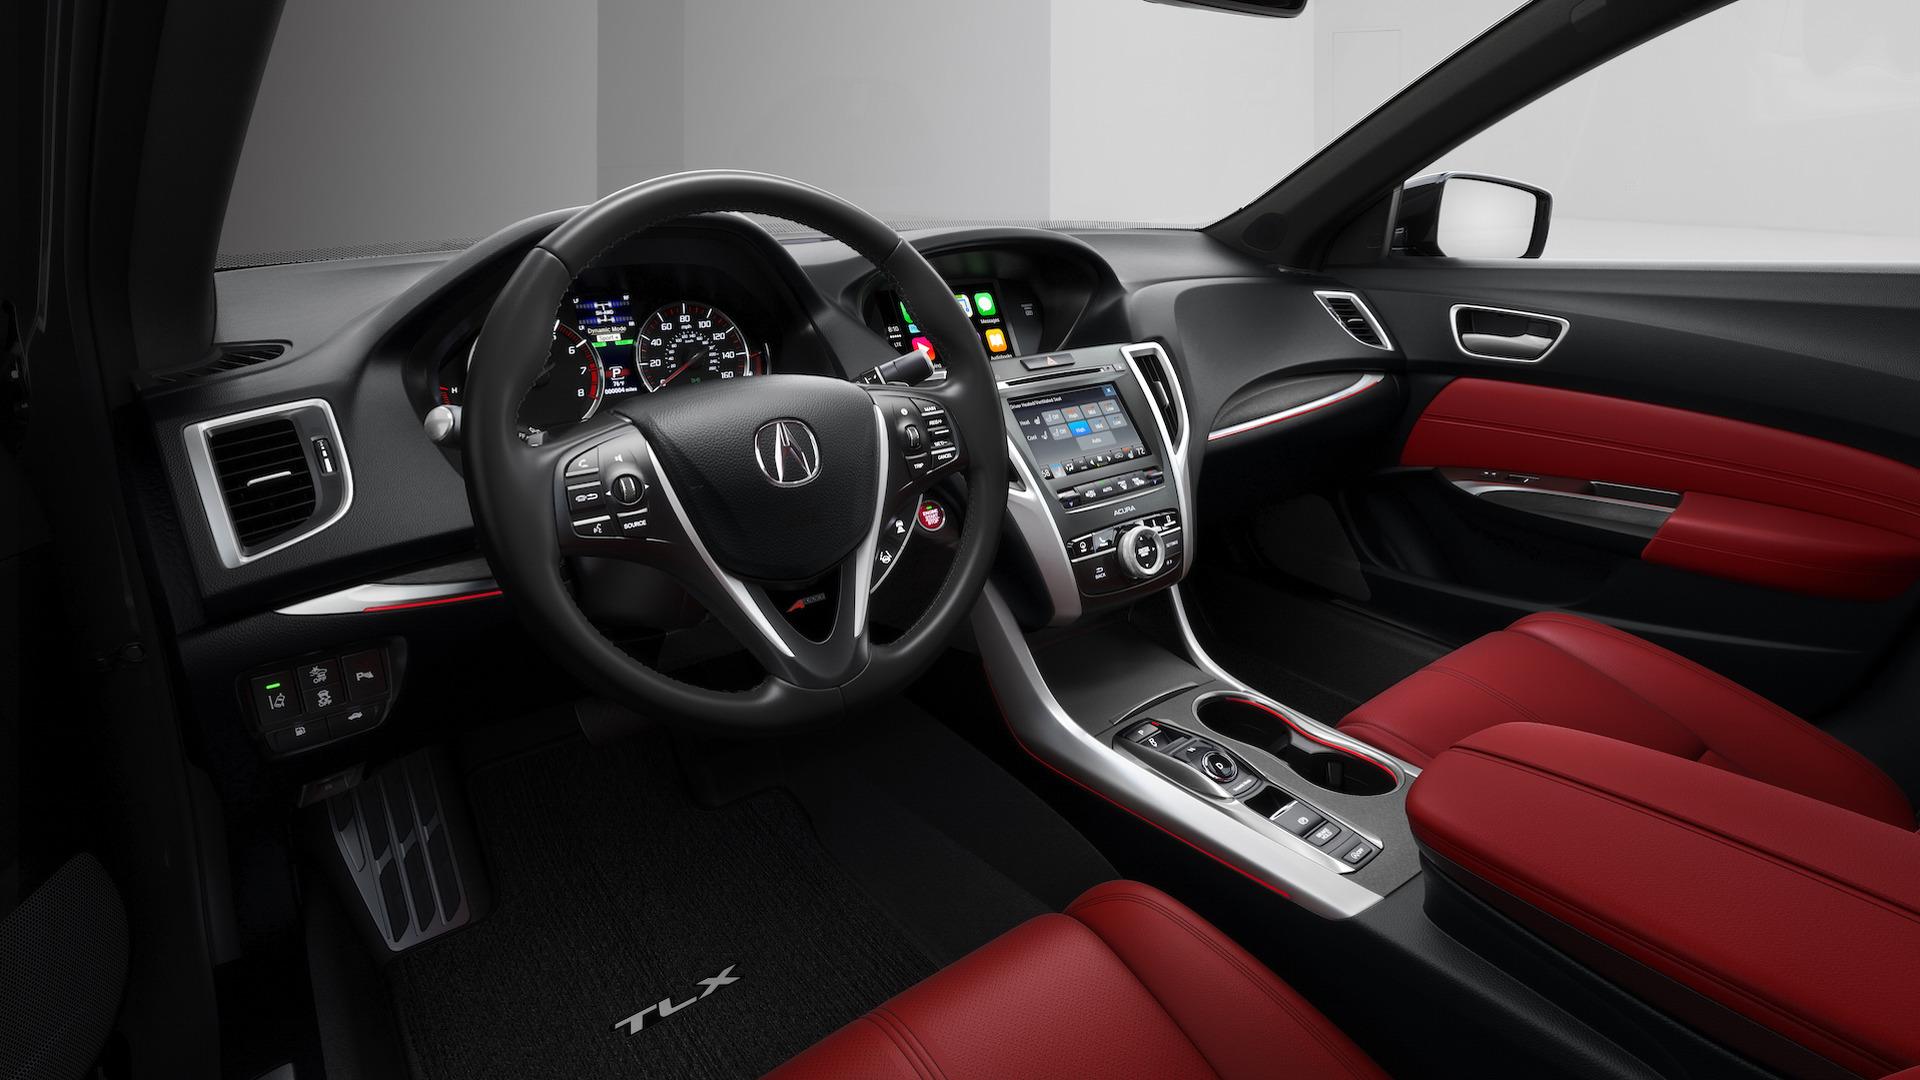 2018 acura tlx revealed new sporty a spec trim image 644077. Black Bedroom Furniture Sets. Home Design Ideas